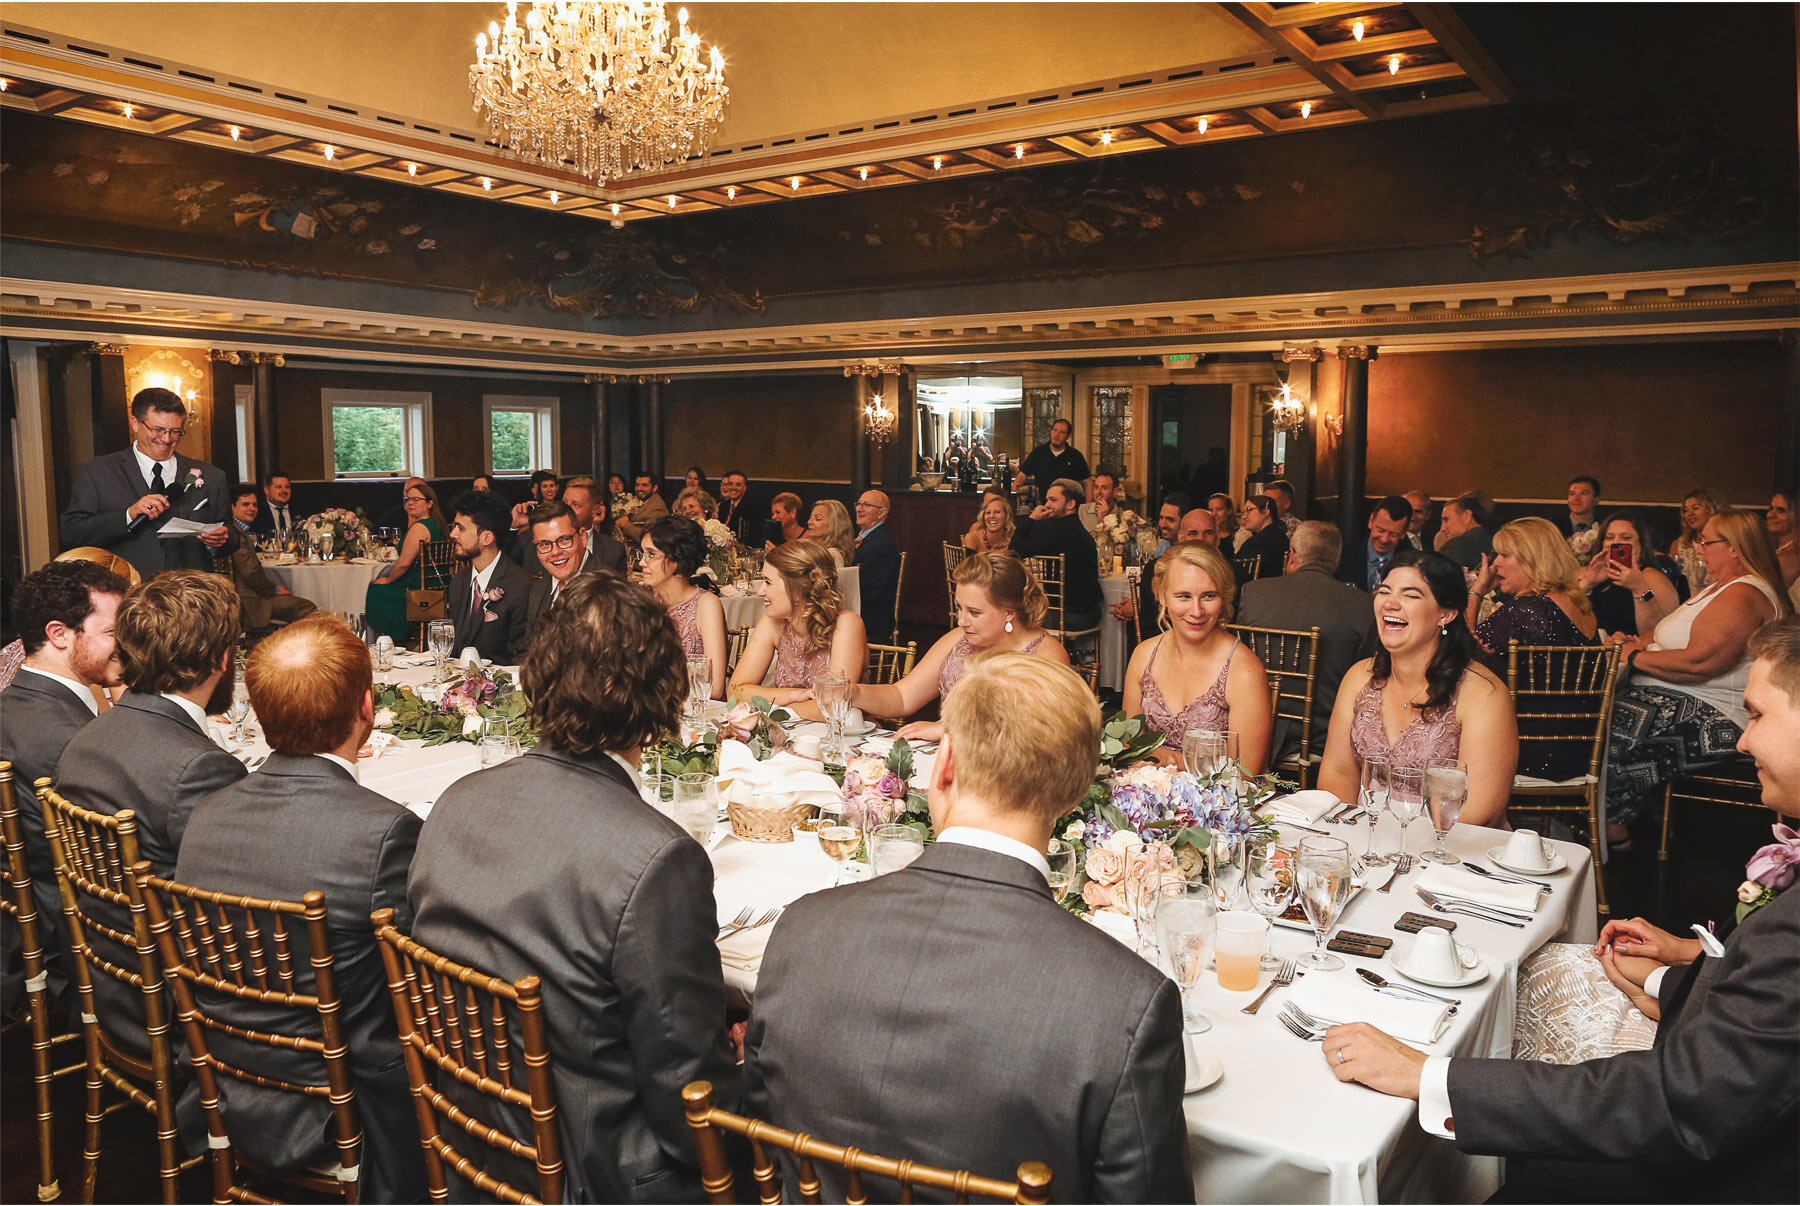 13-Wedding-by-Vick-Photography-Minneapolis-Minnesota-Semple-Mansion-Historic-Venue-Reception-Bride-Groom-Toast-Kaitlyn-and-Nate.jpg